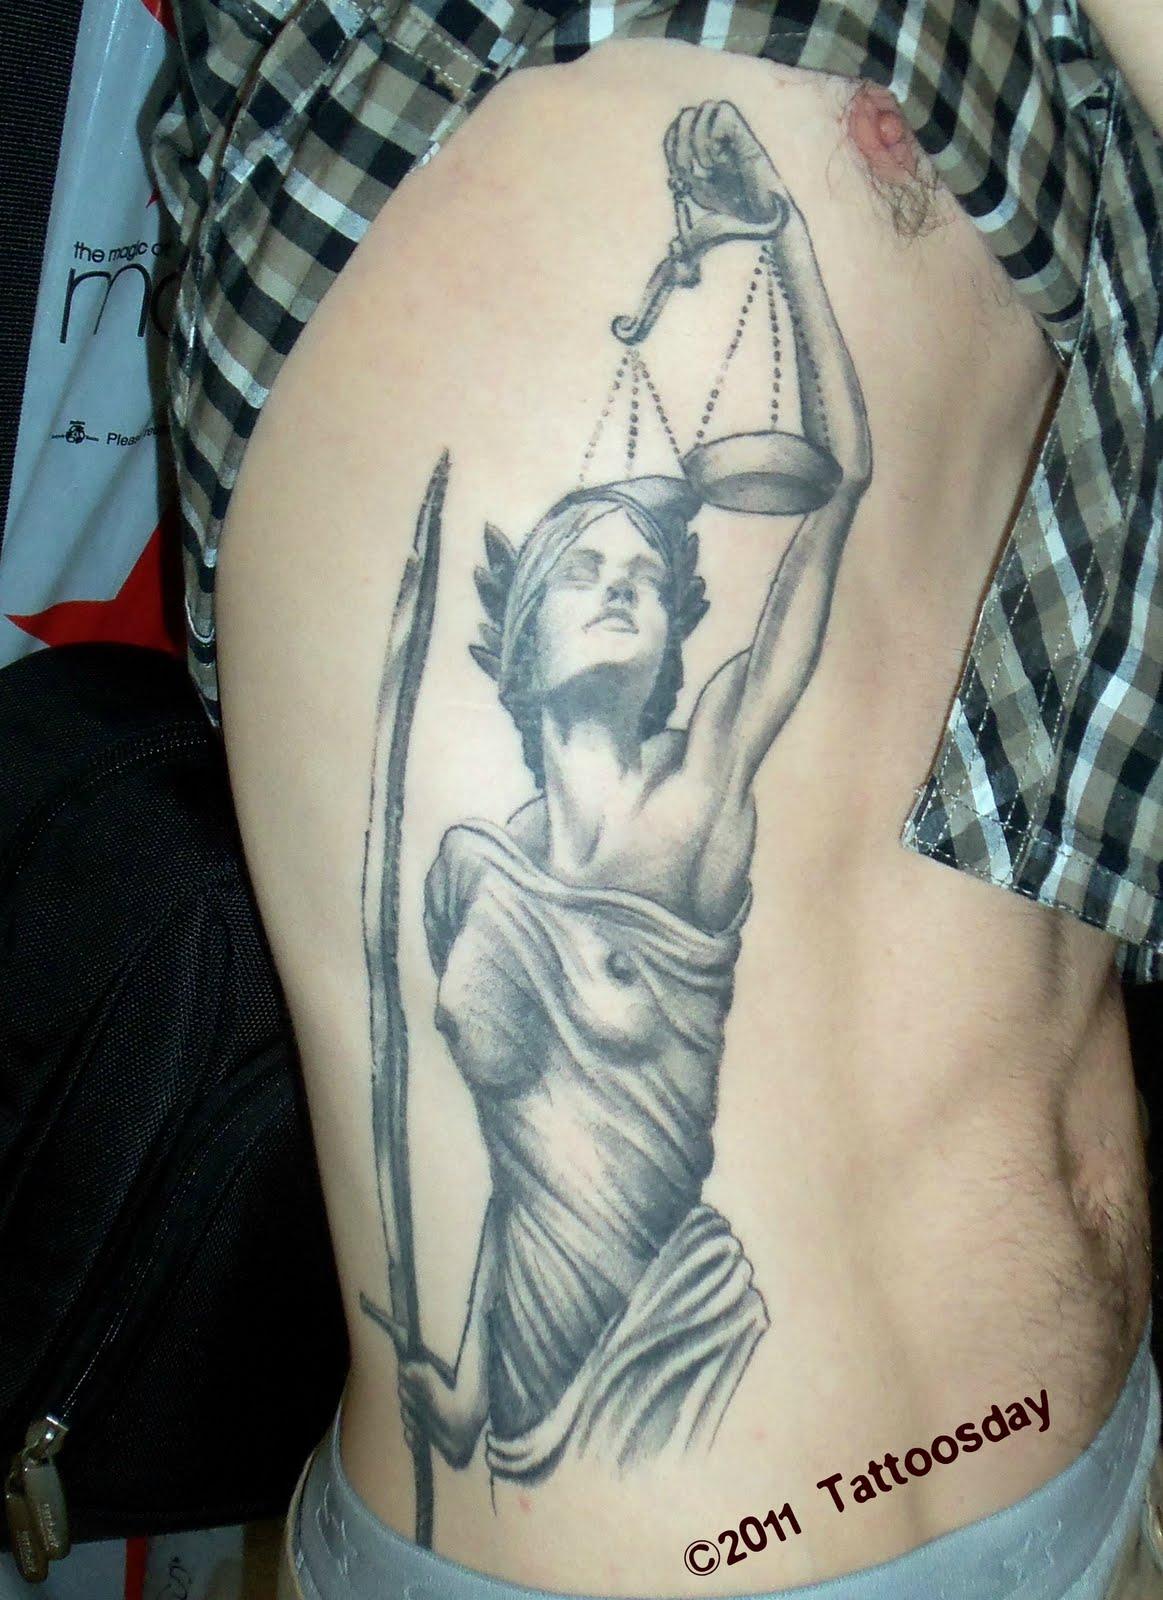 tattoos time tattoos justice tattoo ideas. Black Bedroom Furniture Sets. Home Design Ideas